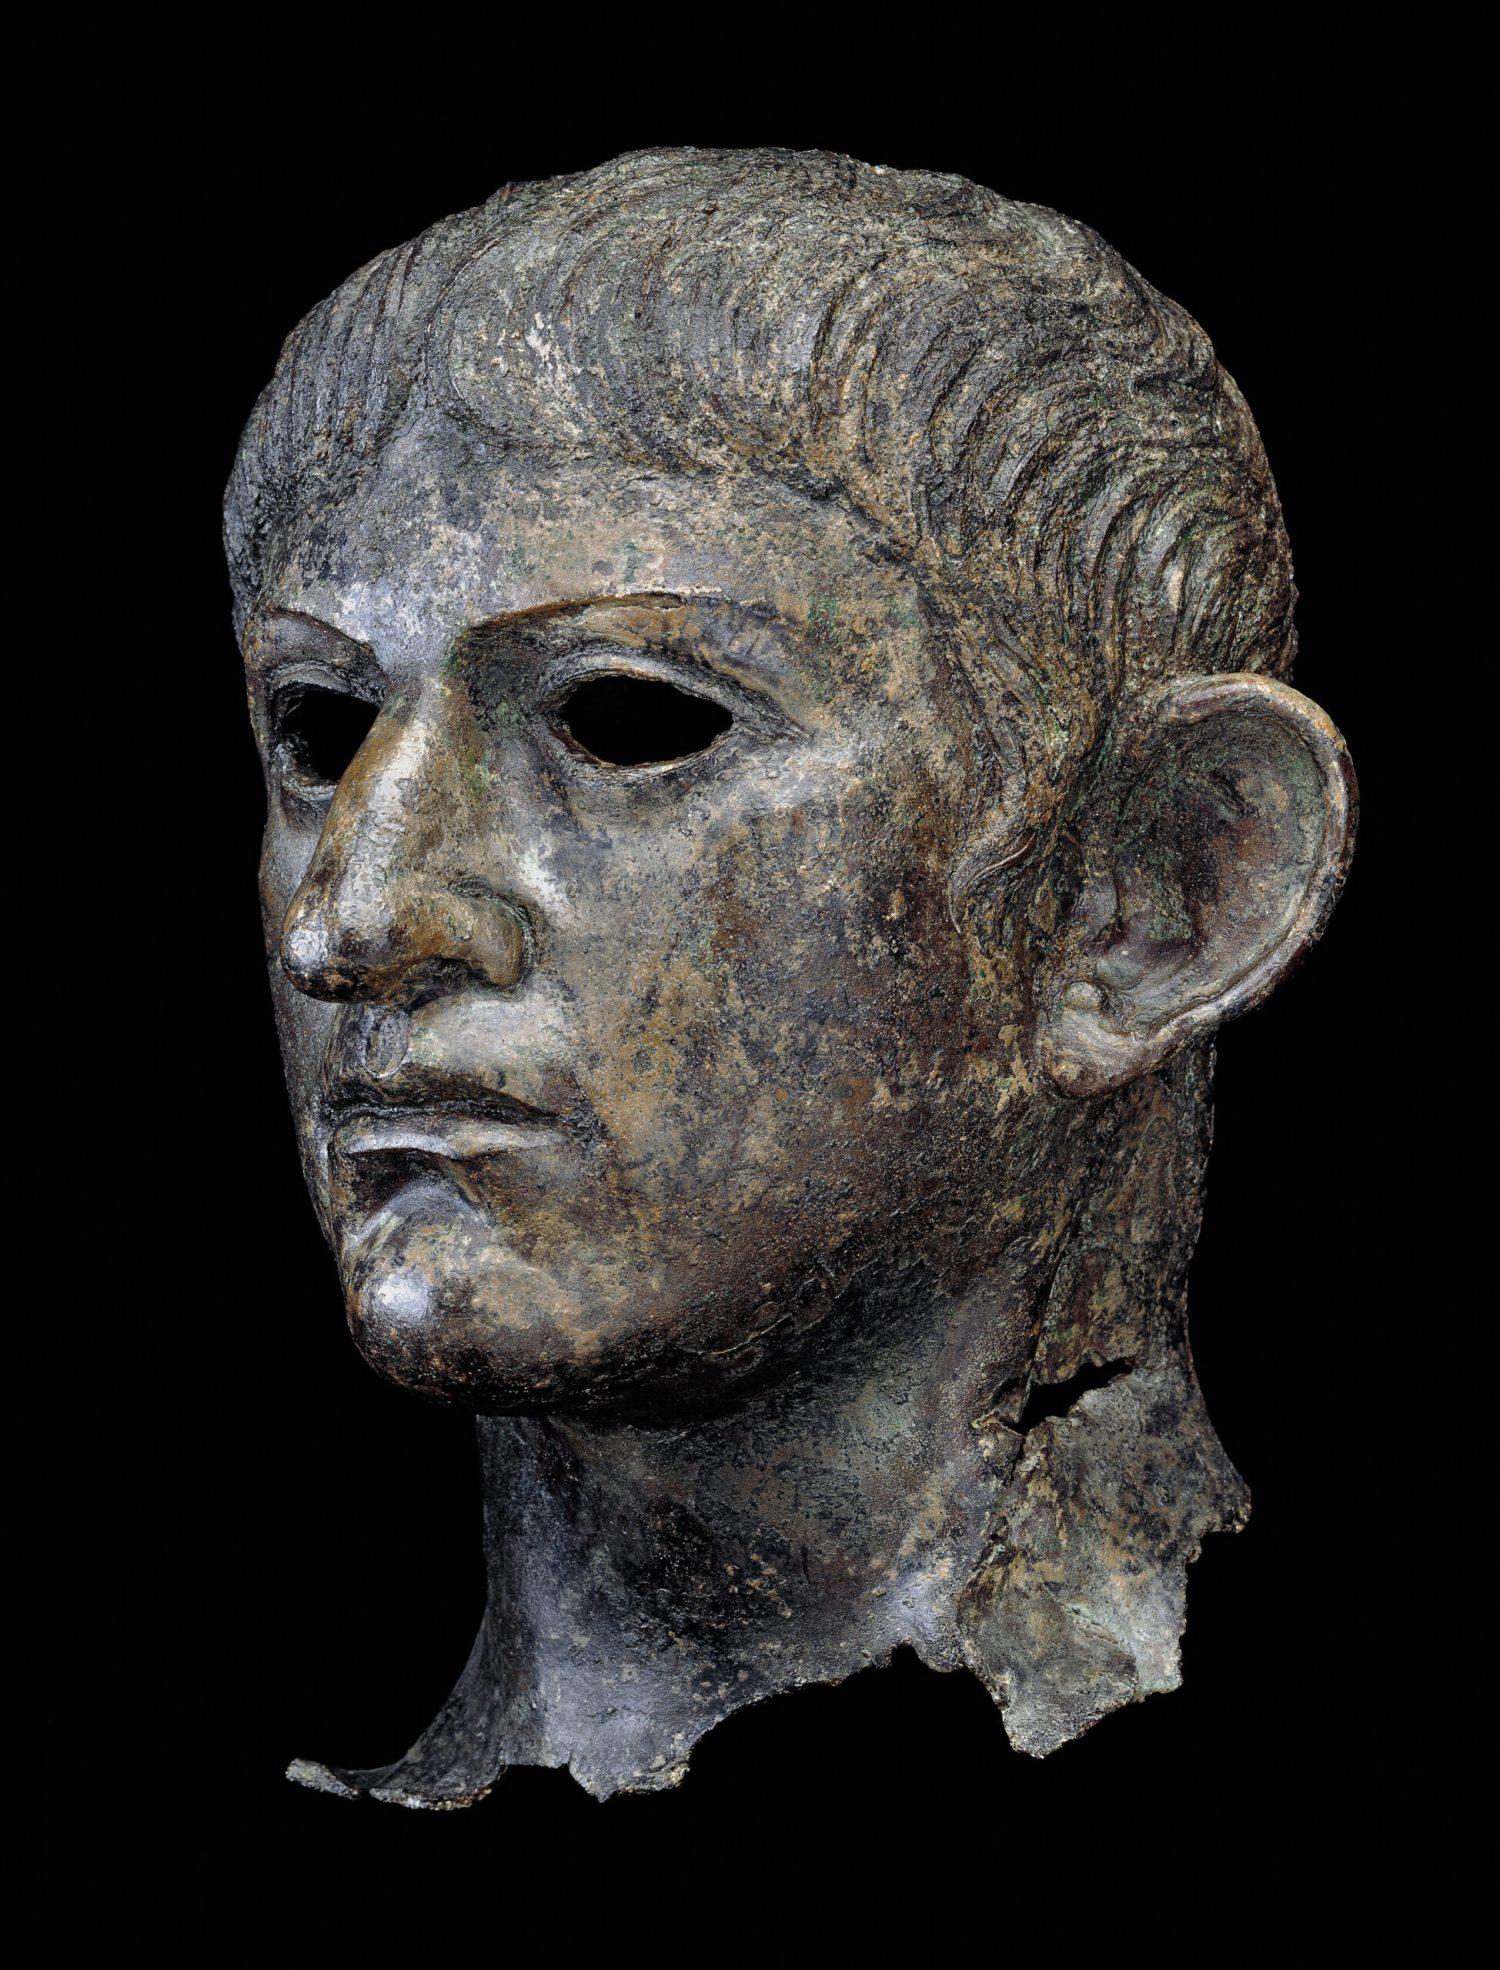 right Head from a bronze statue of the emperor Nero, found in the River Alde in England, AD 54-61. Size: 31.5 x 24.5cm